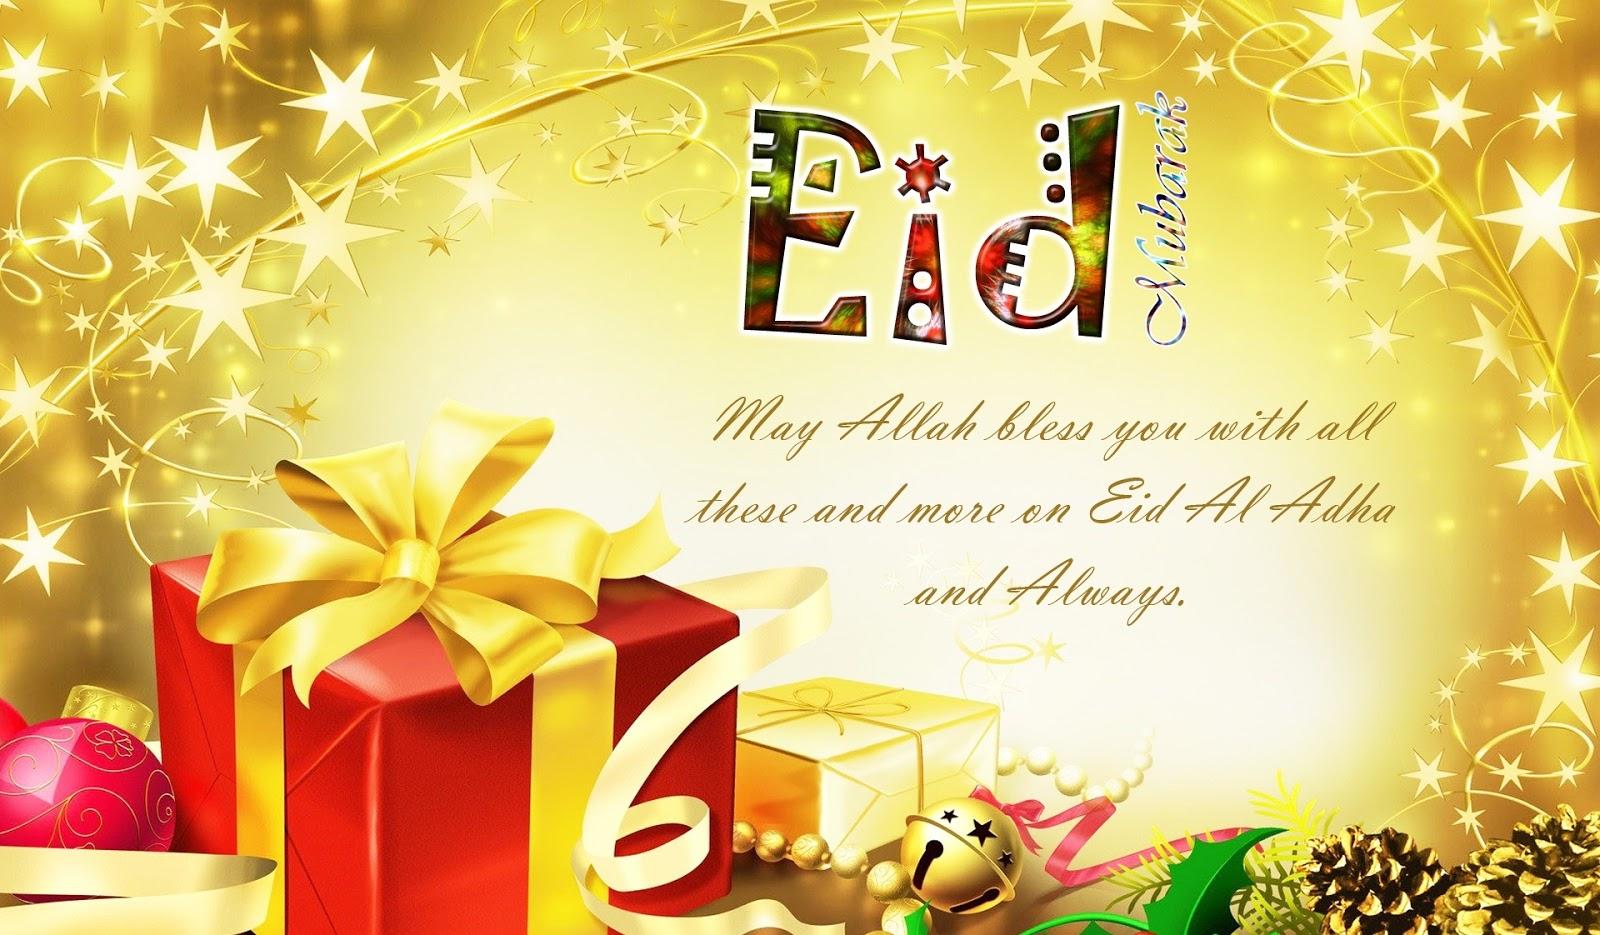 Eid Mubarak wallpaper 7